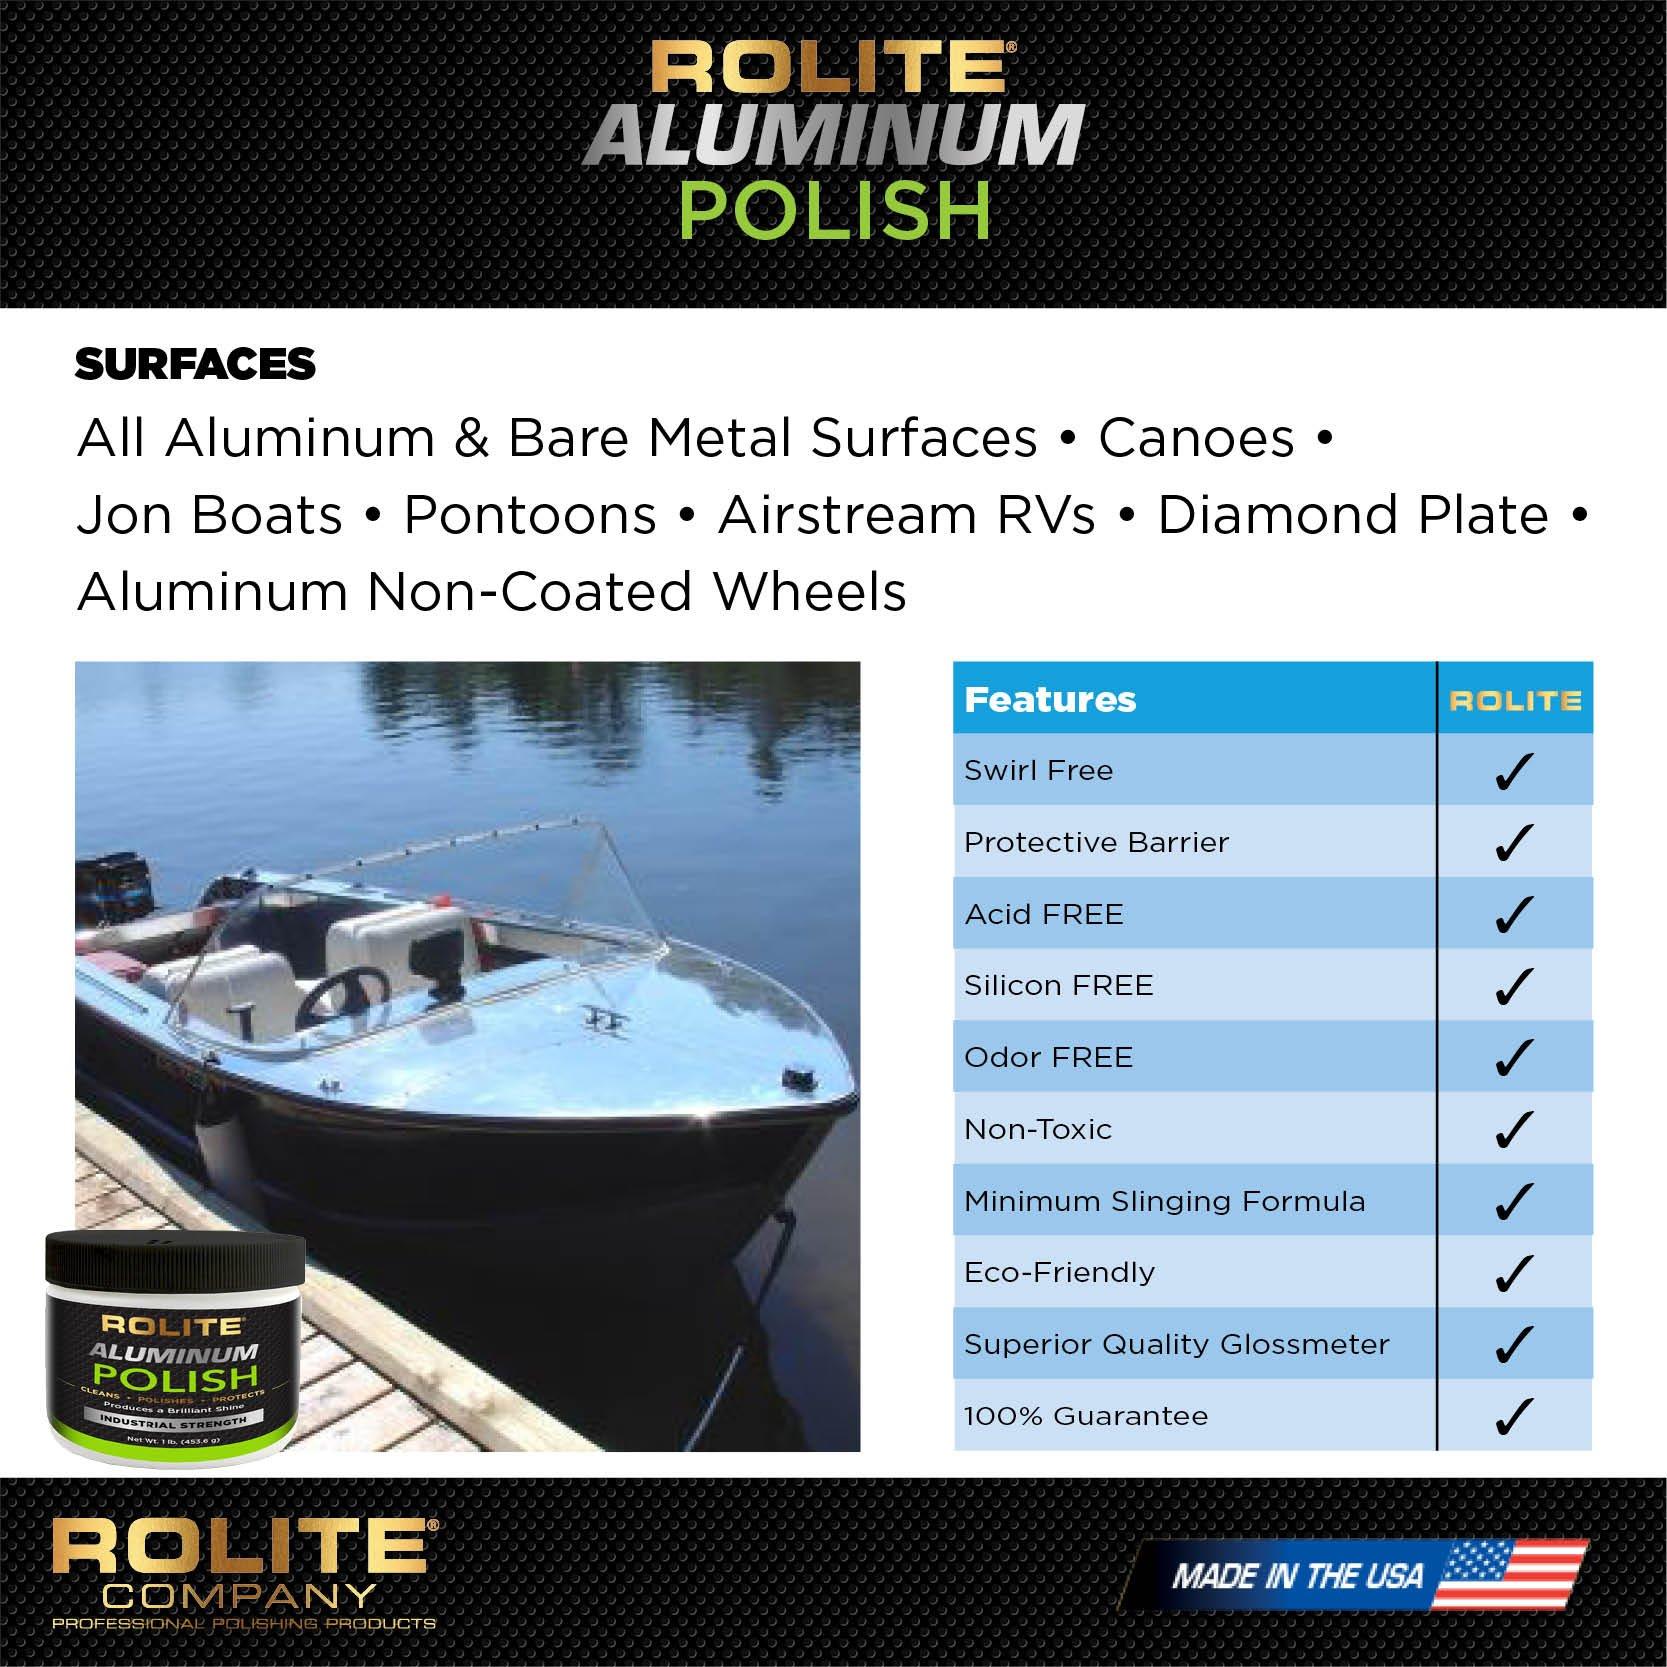 Rolite Aluminum Polish (1lb) for All Aluminum & Bare Metal Surfaces, Canoes, Jon Boats, Pontoons, Diamond Plate, Aluminum Non-Coated Wheels 6 Pack by Rolite (Image #3)